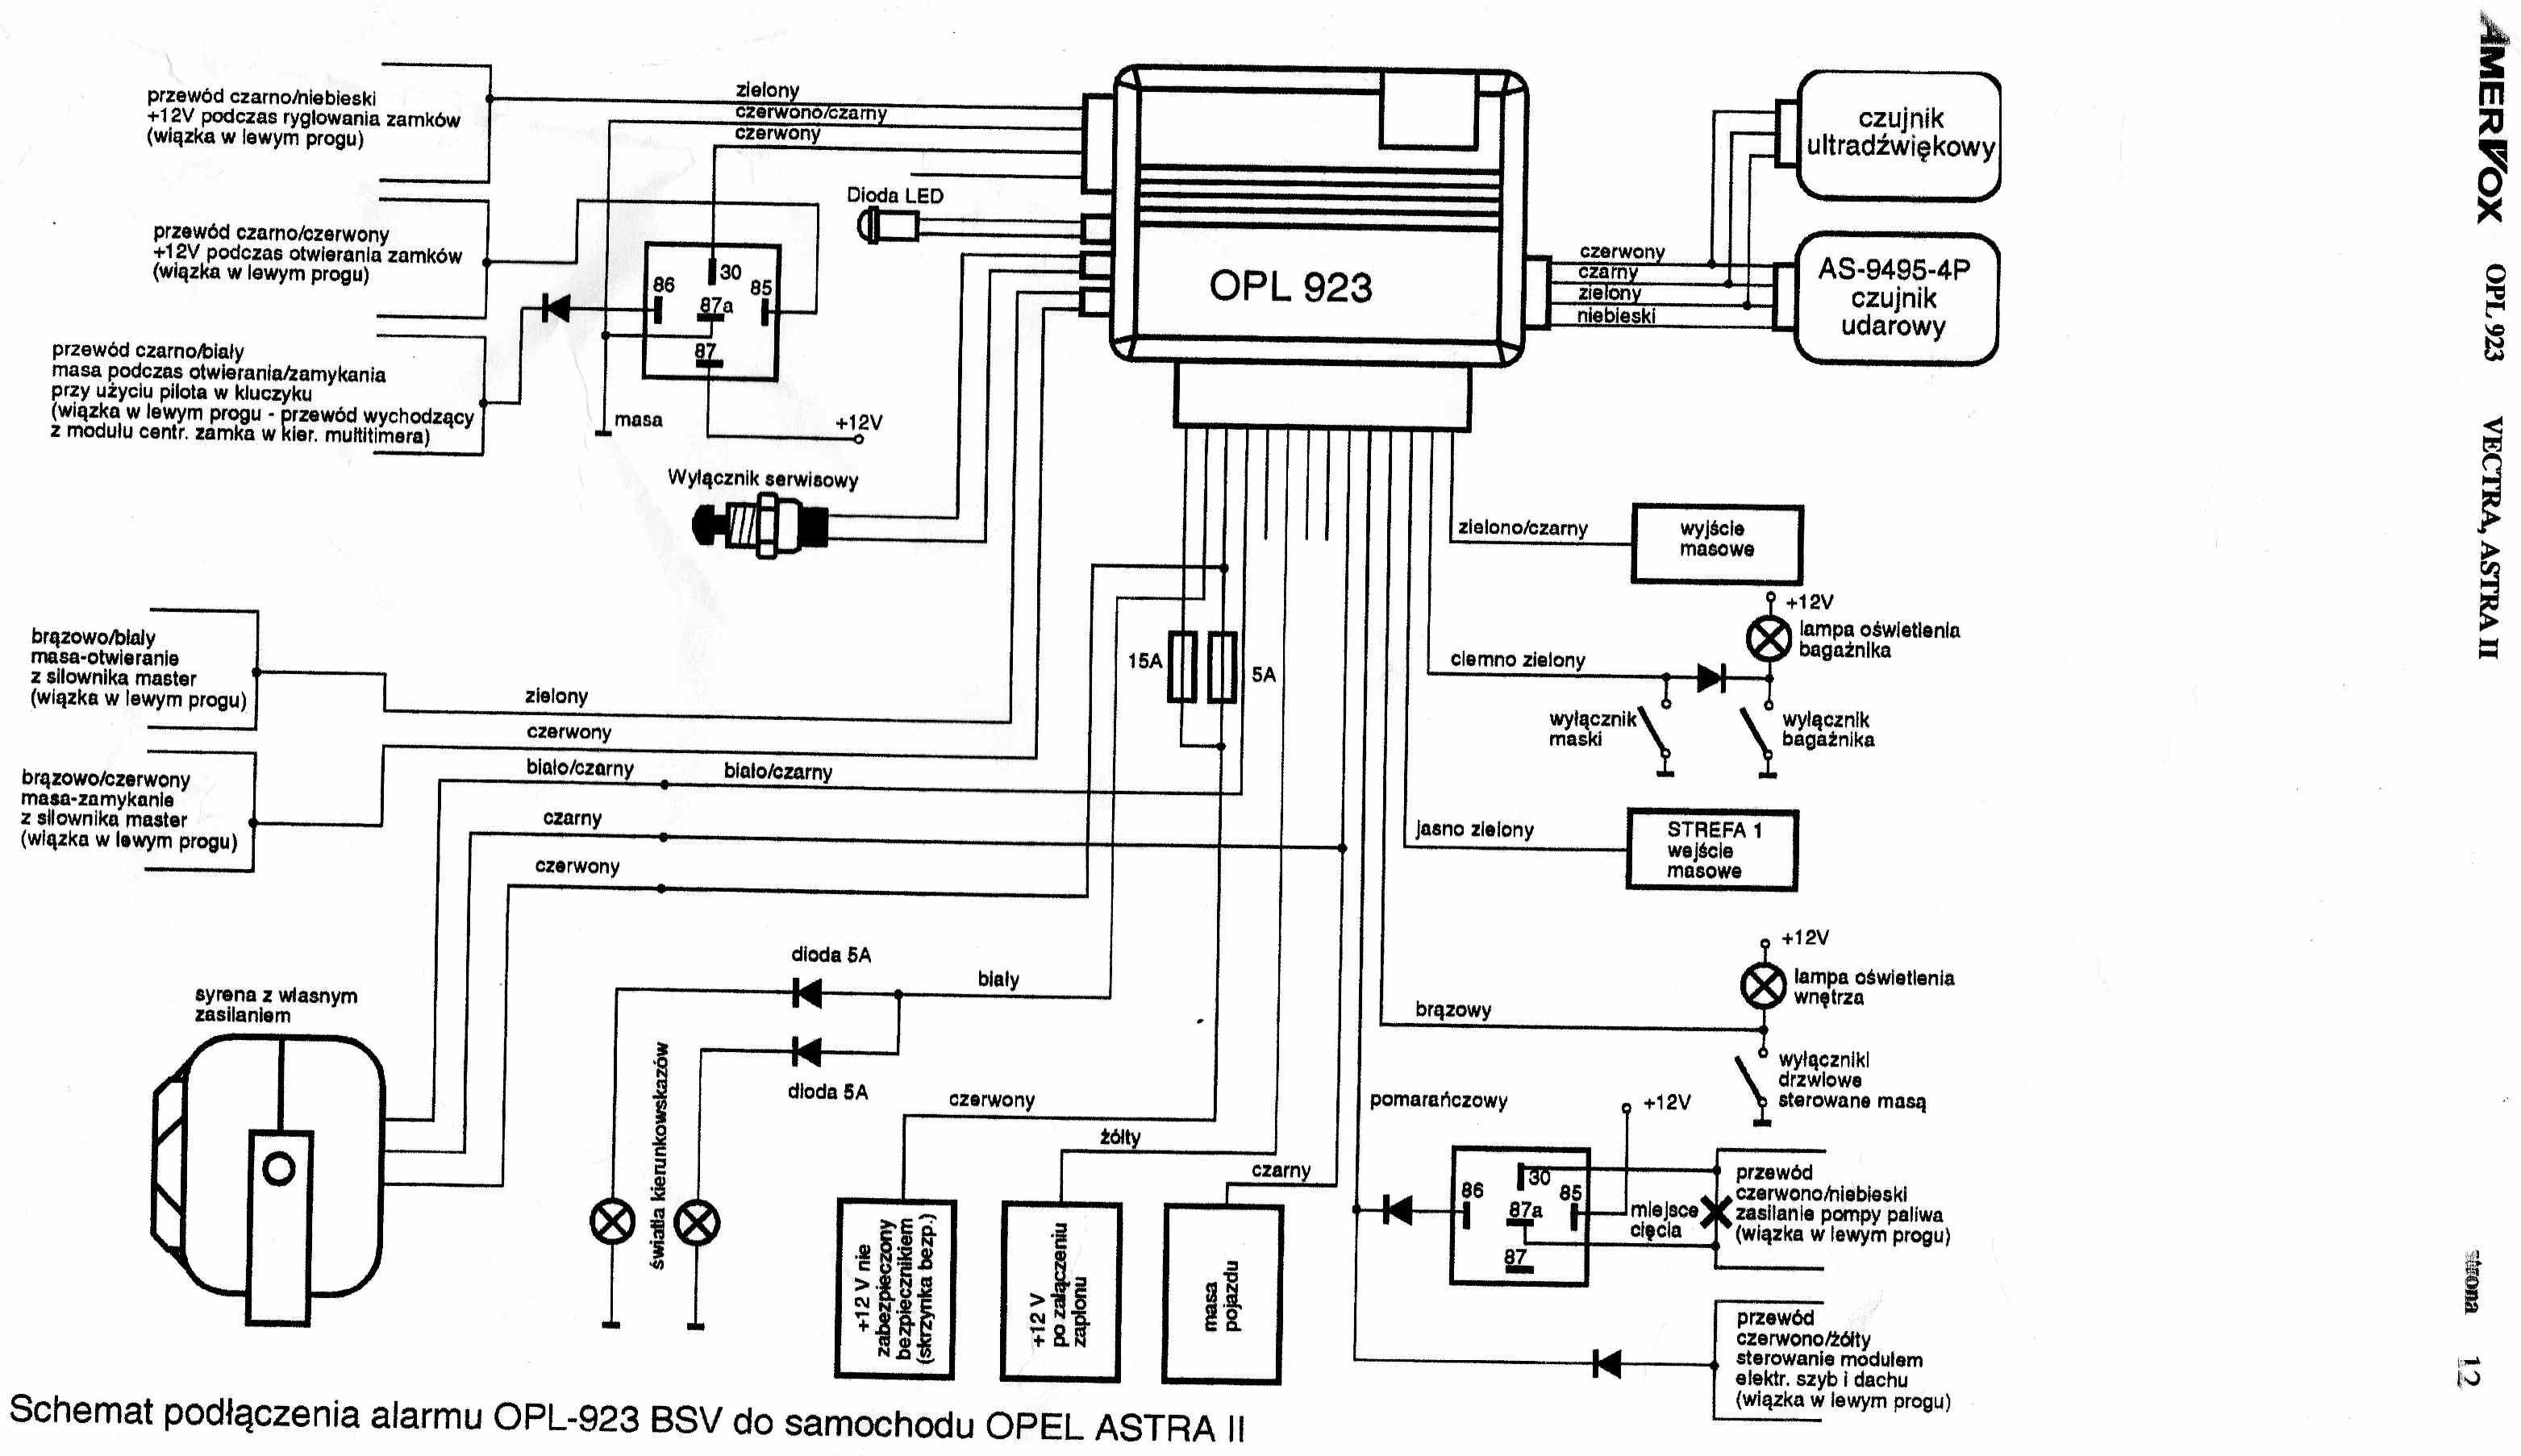 Schemat alarmu Opel - Amervox OPL 923